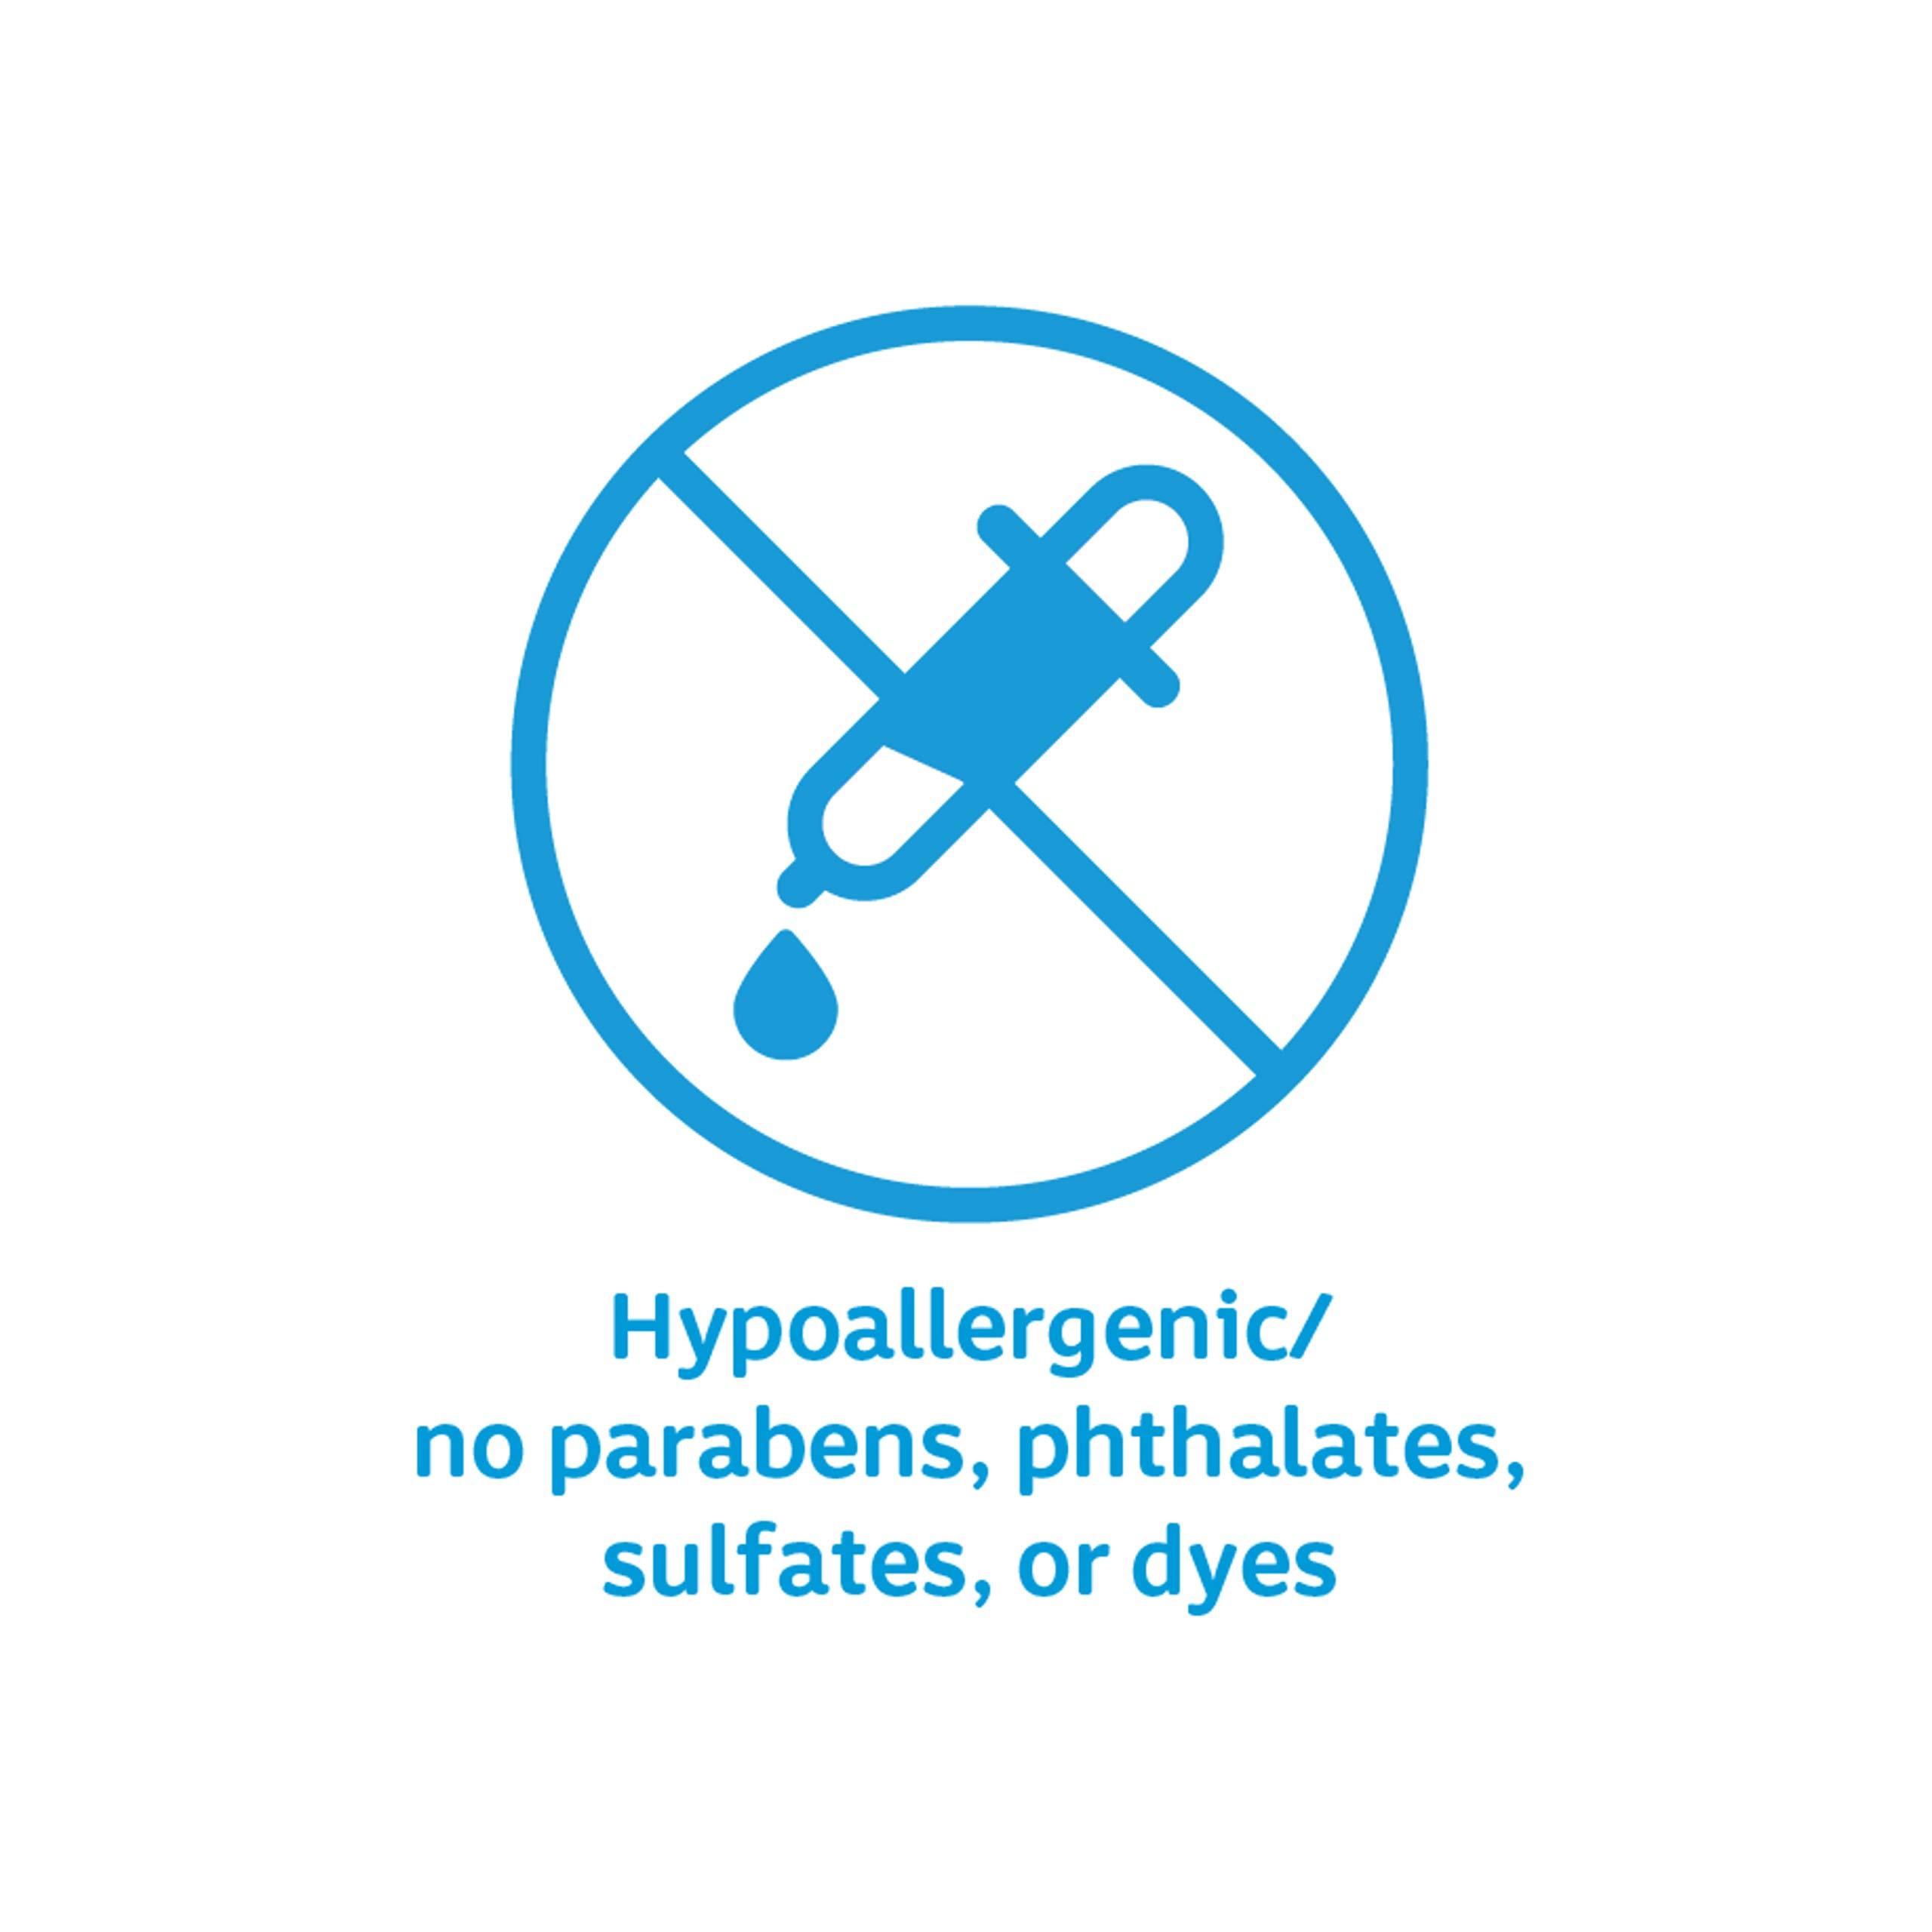 Johnson's Tear Free Baby Shampoo, Free of Parabens, Phthalates, Sulfates and Dyes, 20.3 fl. oz